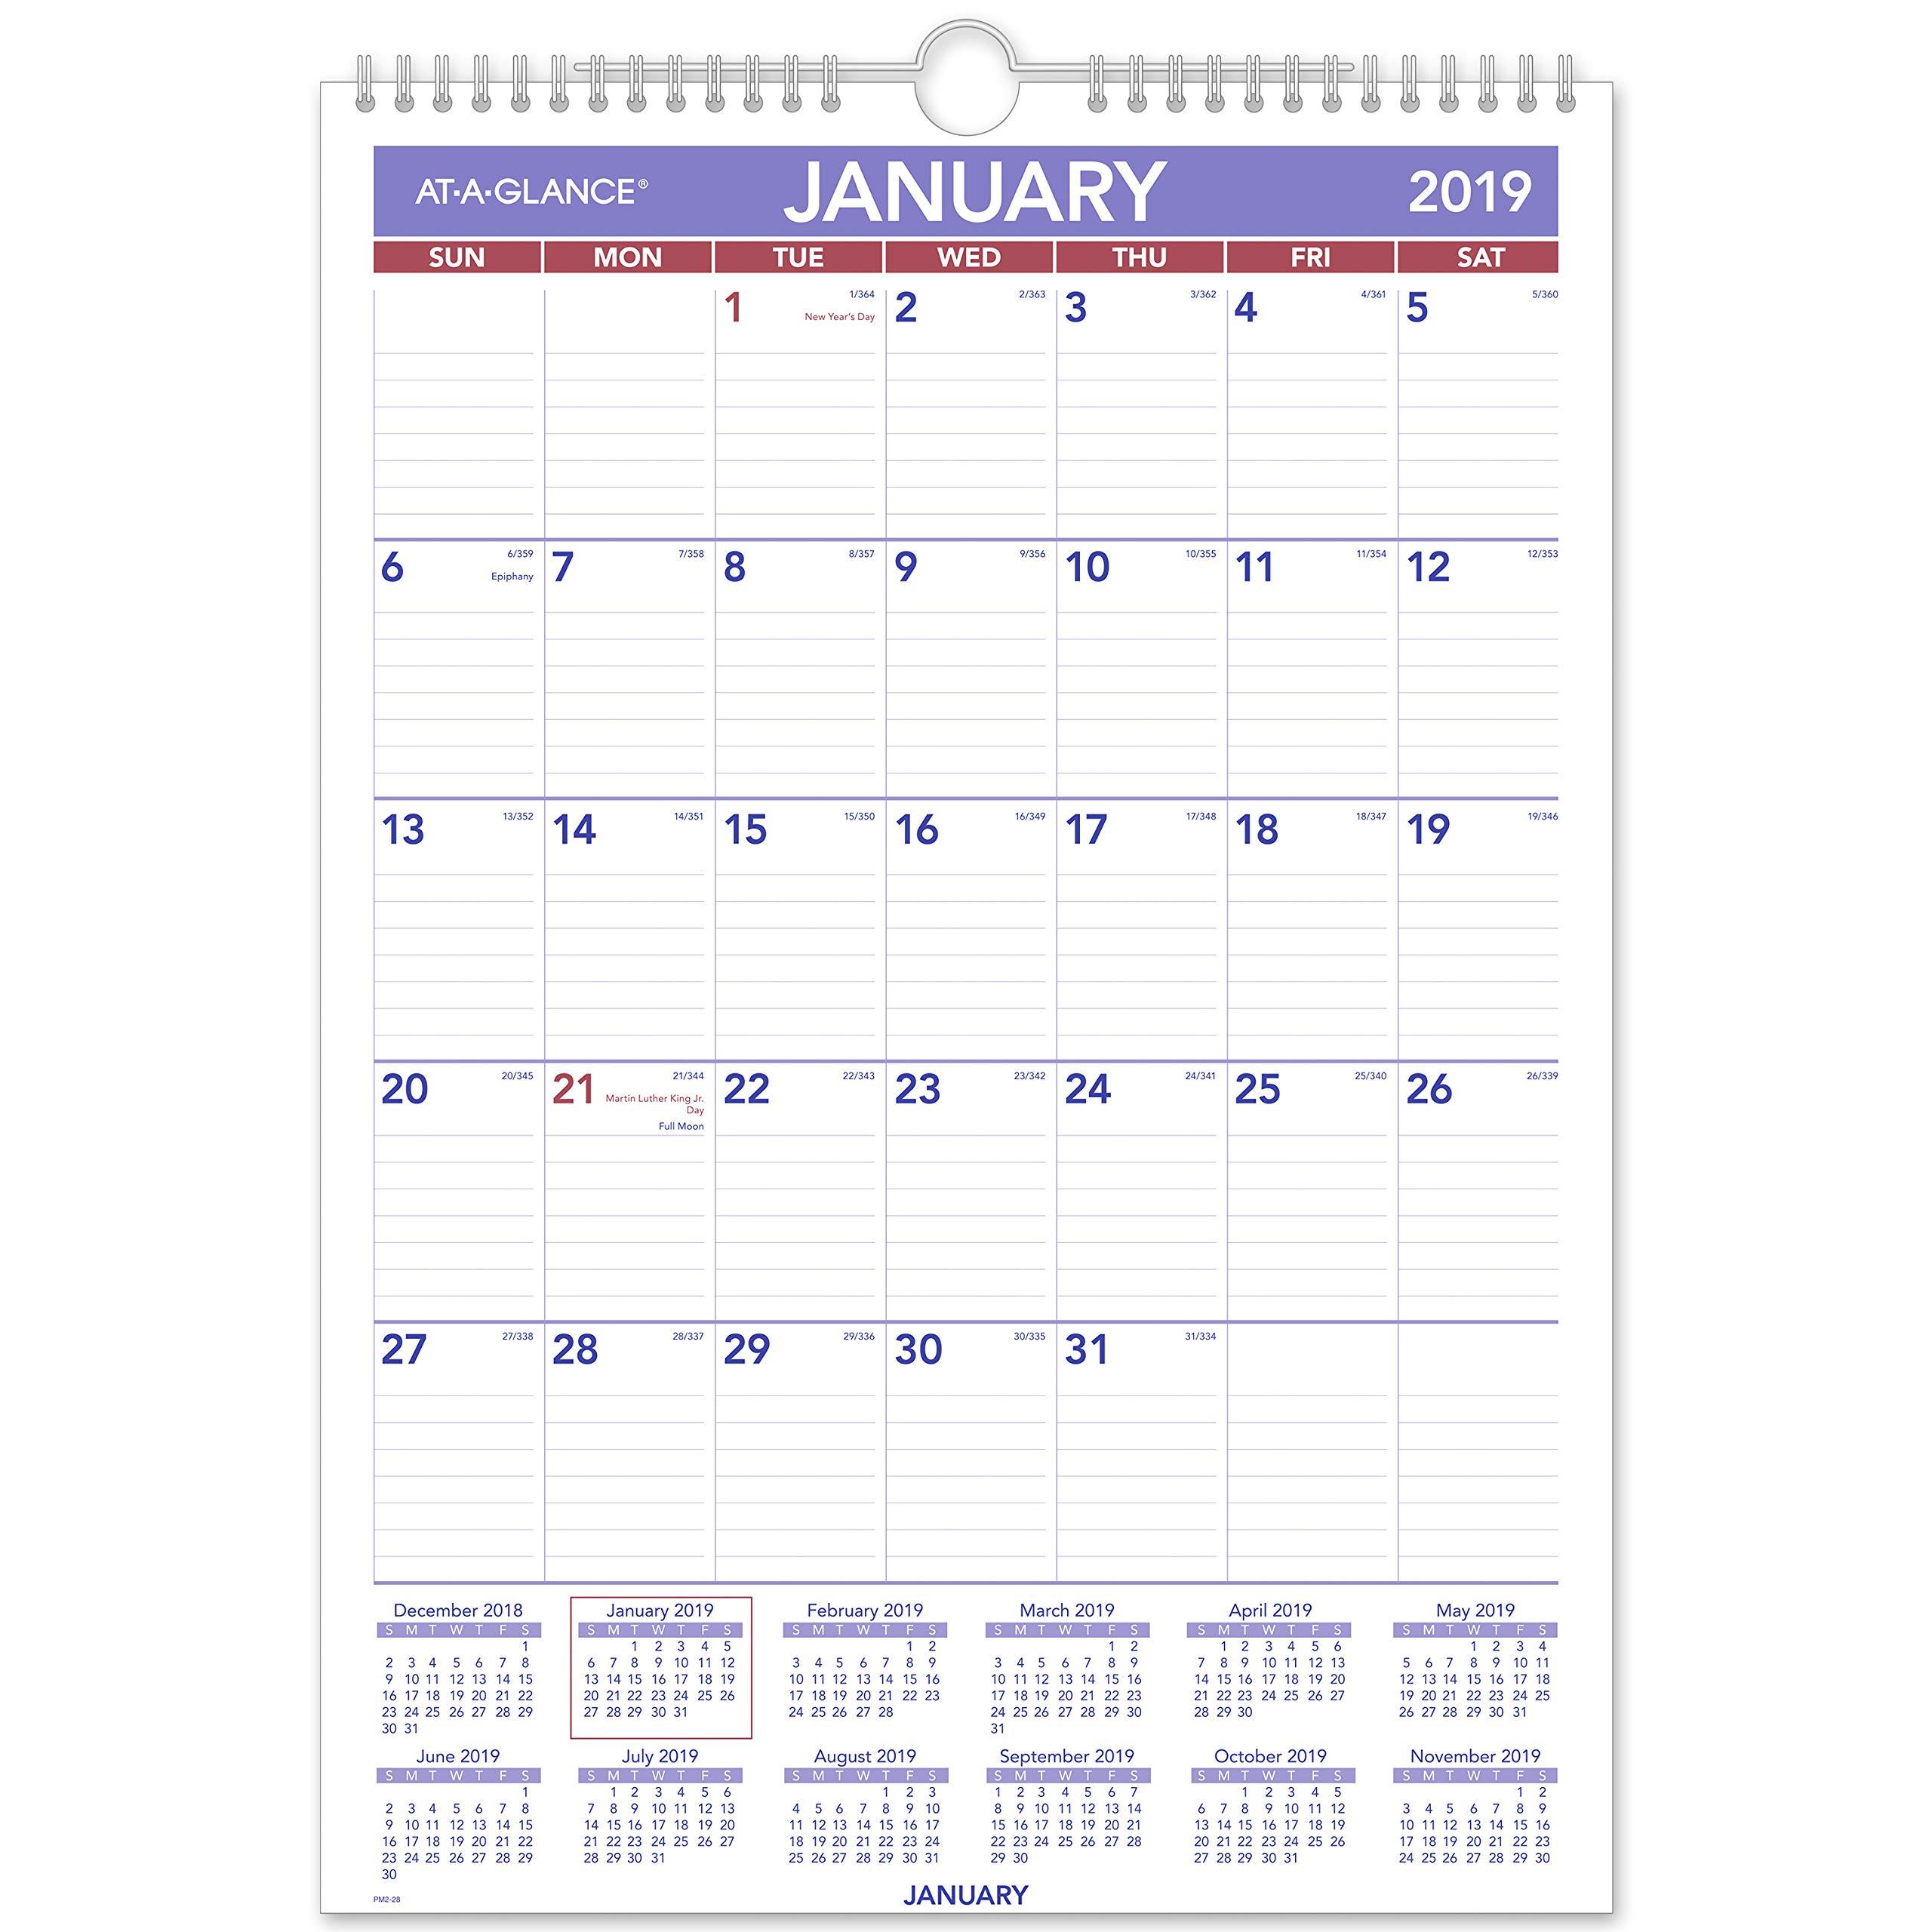 AT-A-GLANCE 2019 Monthly Wall Calendar, 12'' x 17'', Medium, Wirebound (PM228)